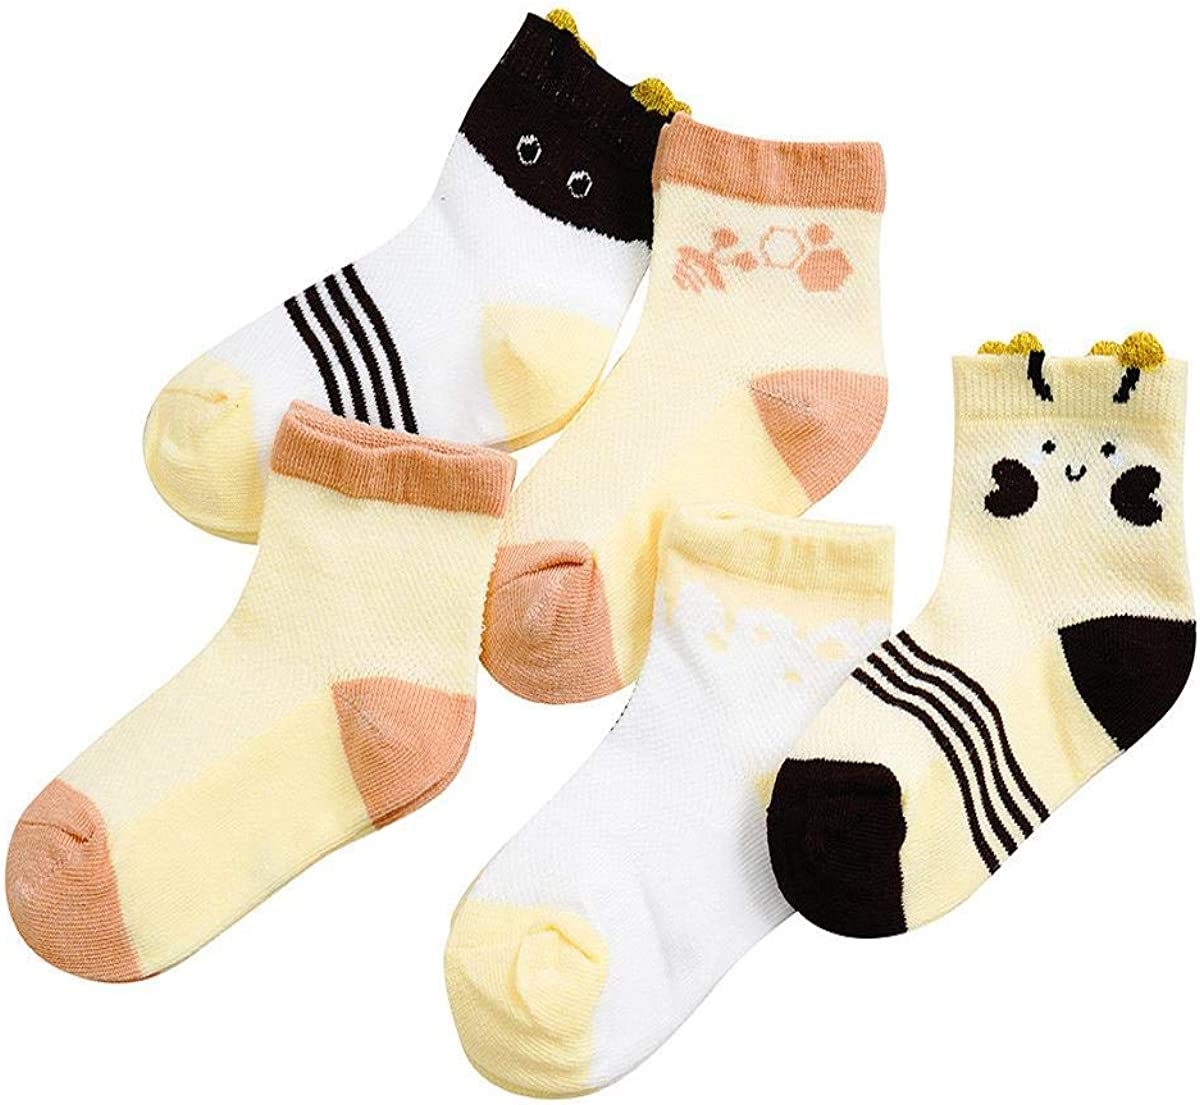 Vertily Childrens Cartoon Mesh Breathable Sweat Socks Short Socks Five Pairs A Pack Kids Infant Baby Boys Girls Breathable Cartoon Animals Anti-Slip 5 Pairs Socks